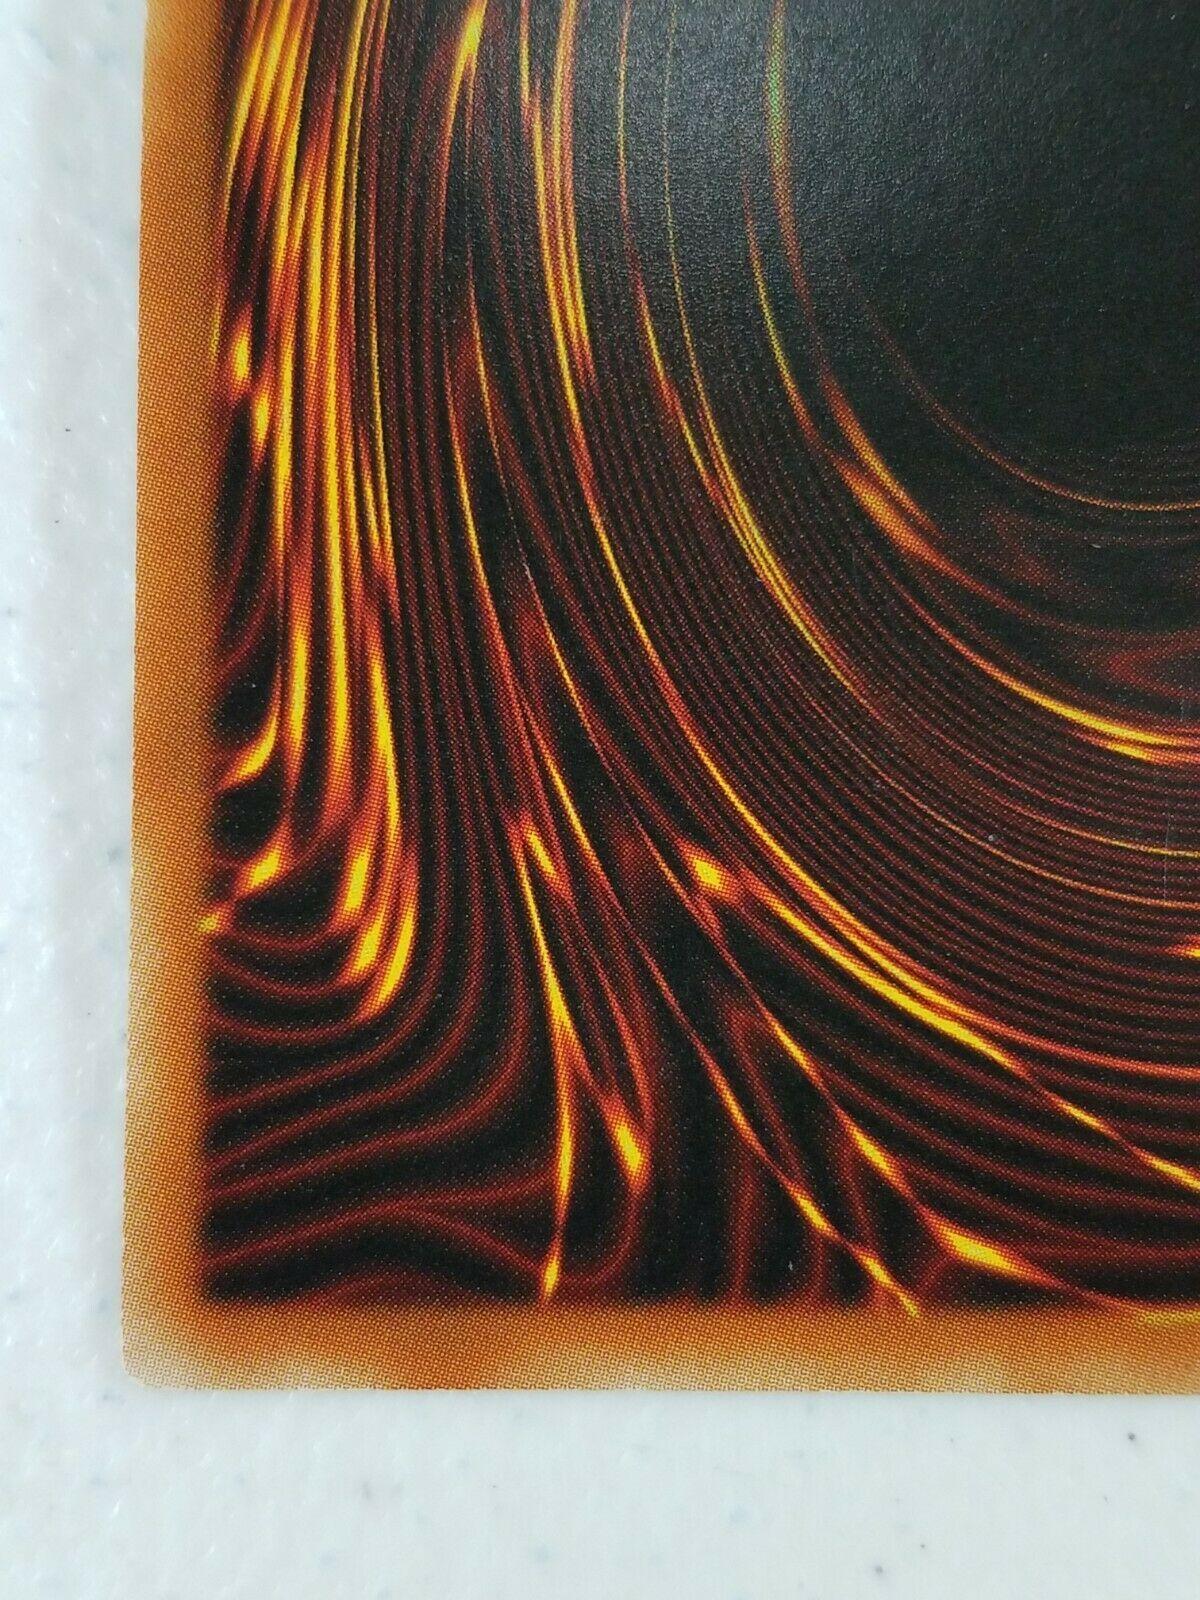 Yu-gi-oh! Trading Card - Ally of Justice Catastor - HA01-EN026 - Secret Rare